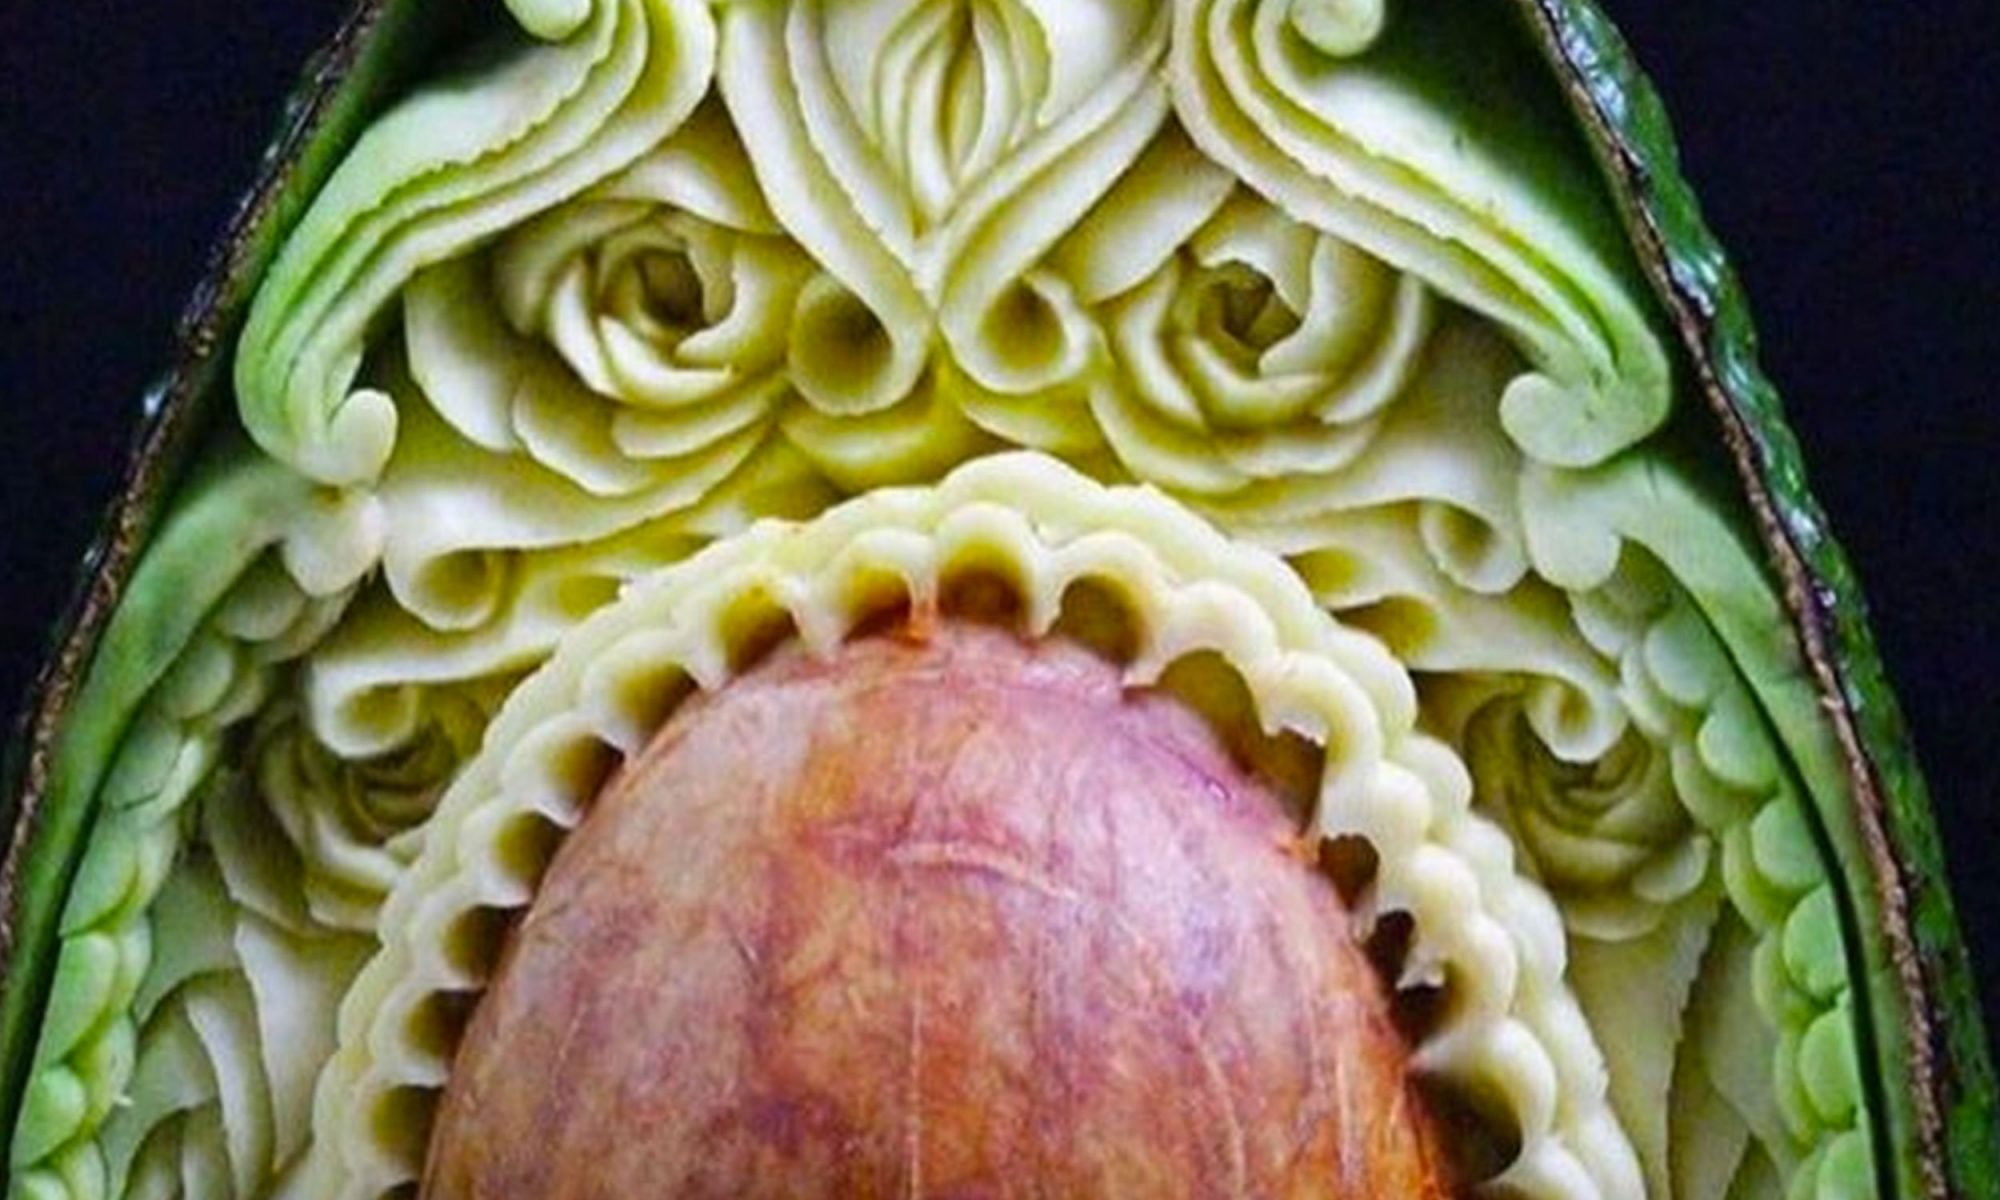 EC: This Avocado Art Is Surprisingly Captivating